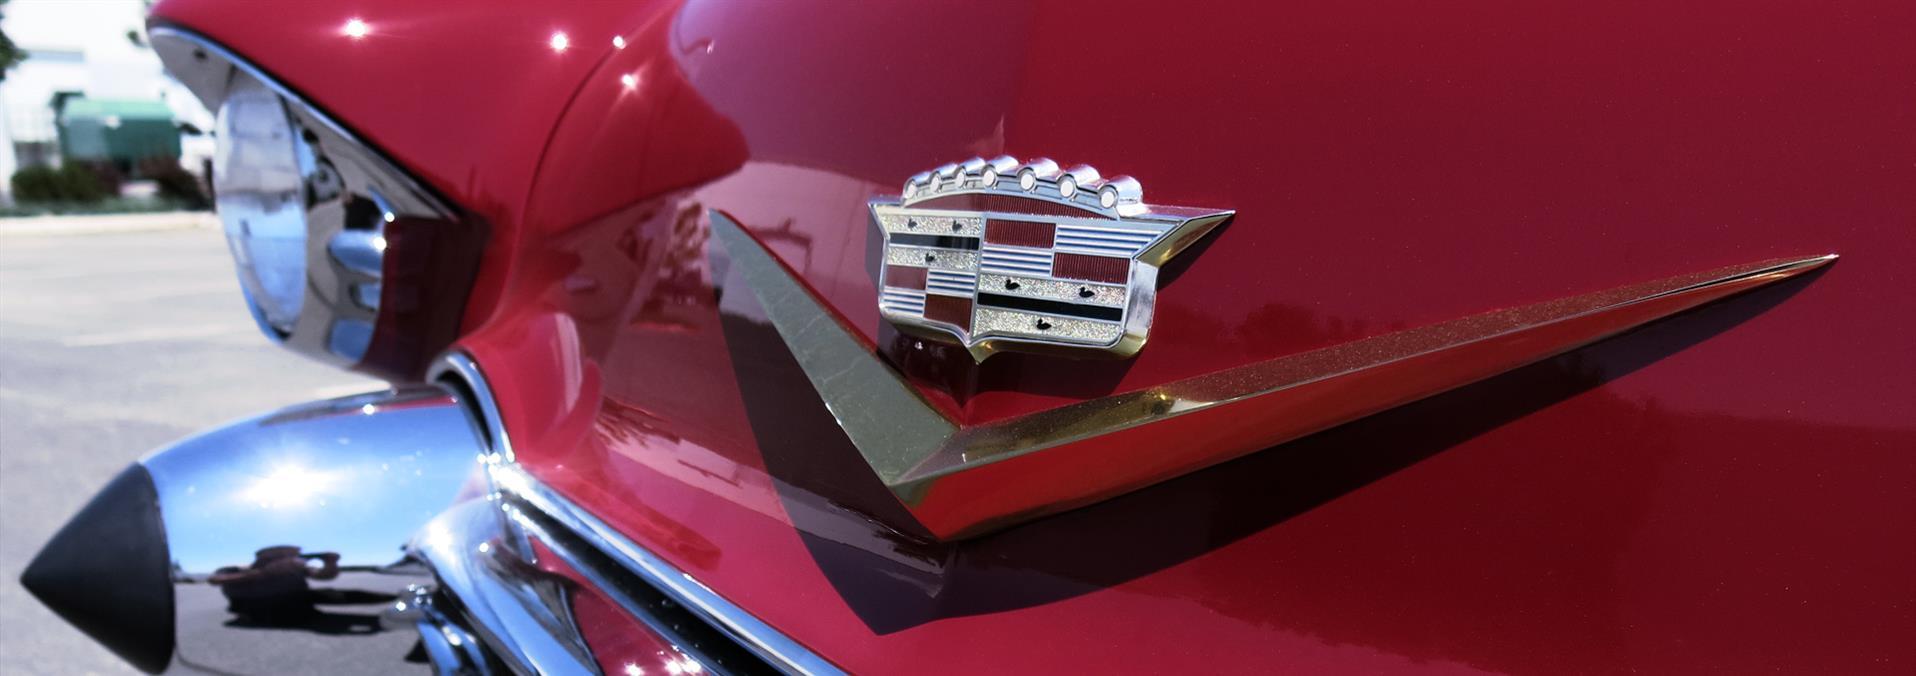 Cool Classics Reno NV | New & Used Cars Trucks Sales & Service